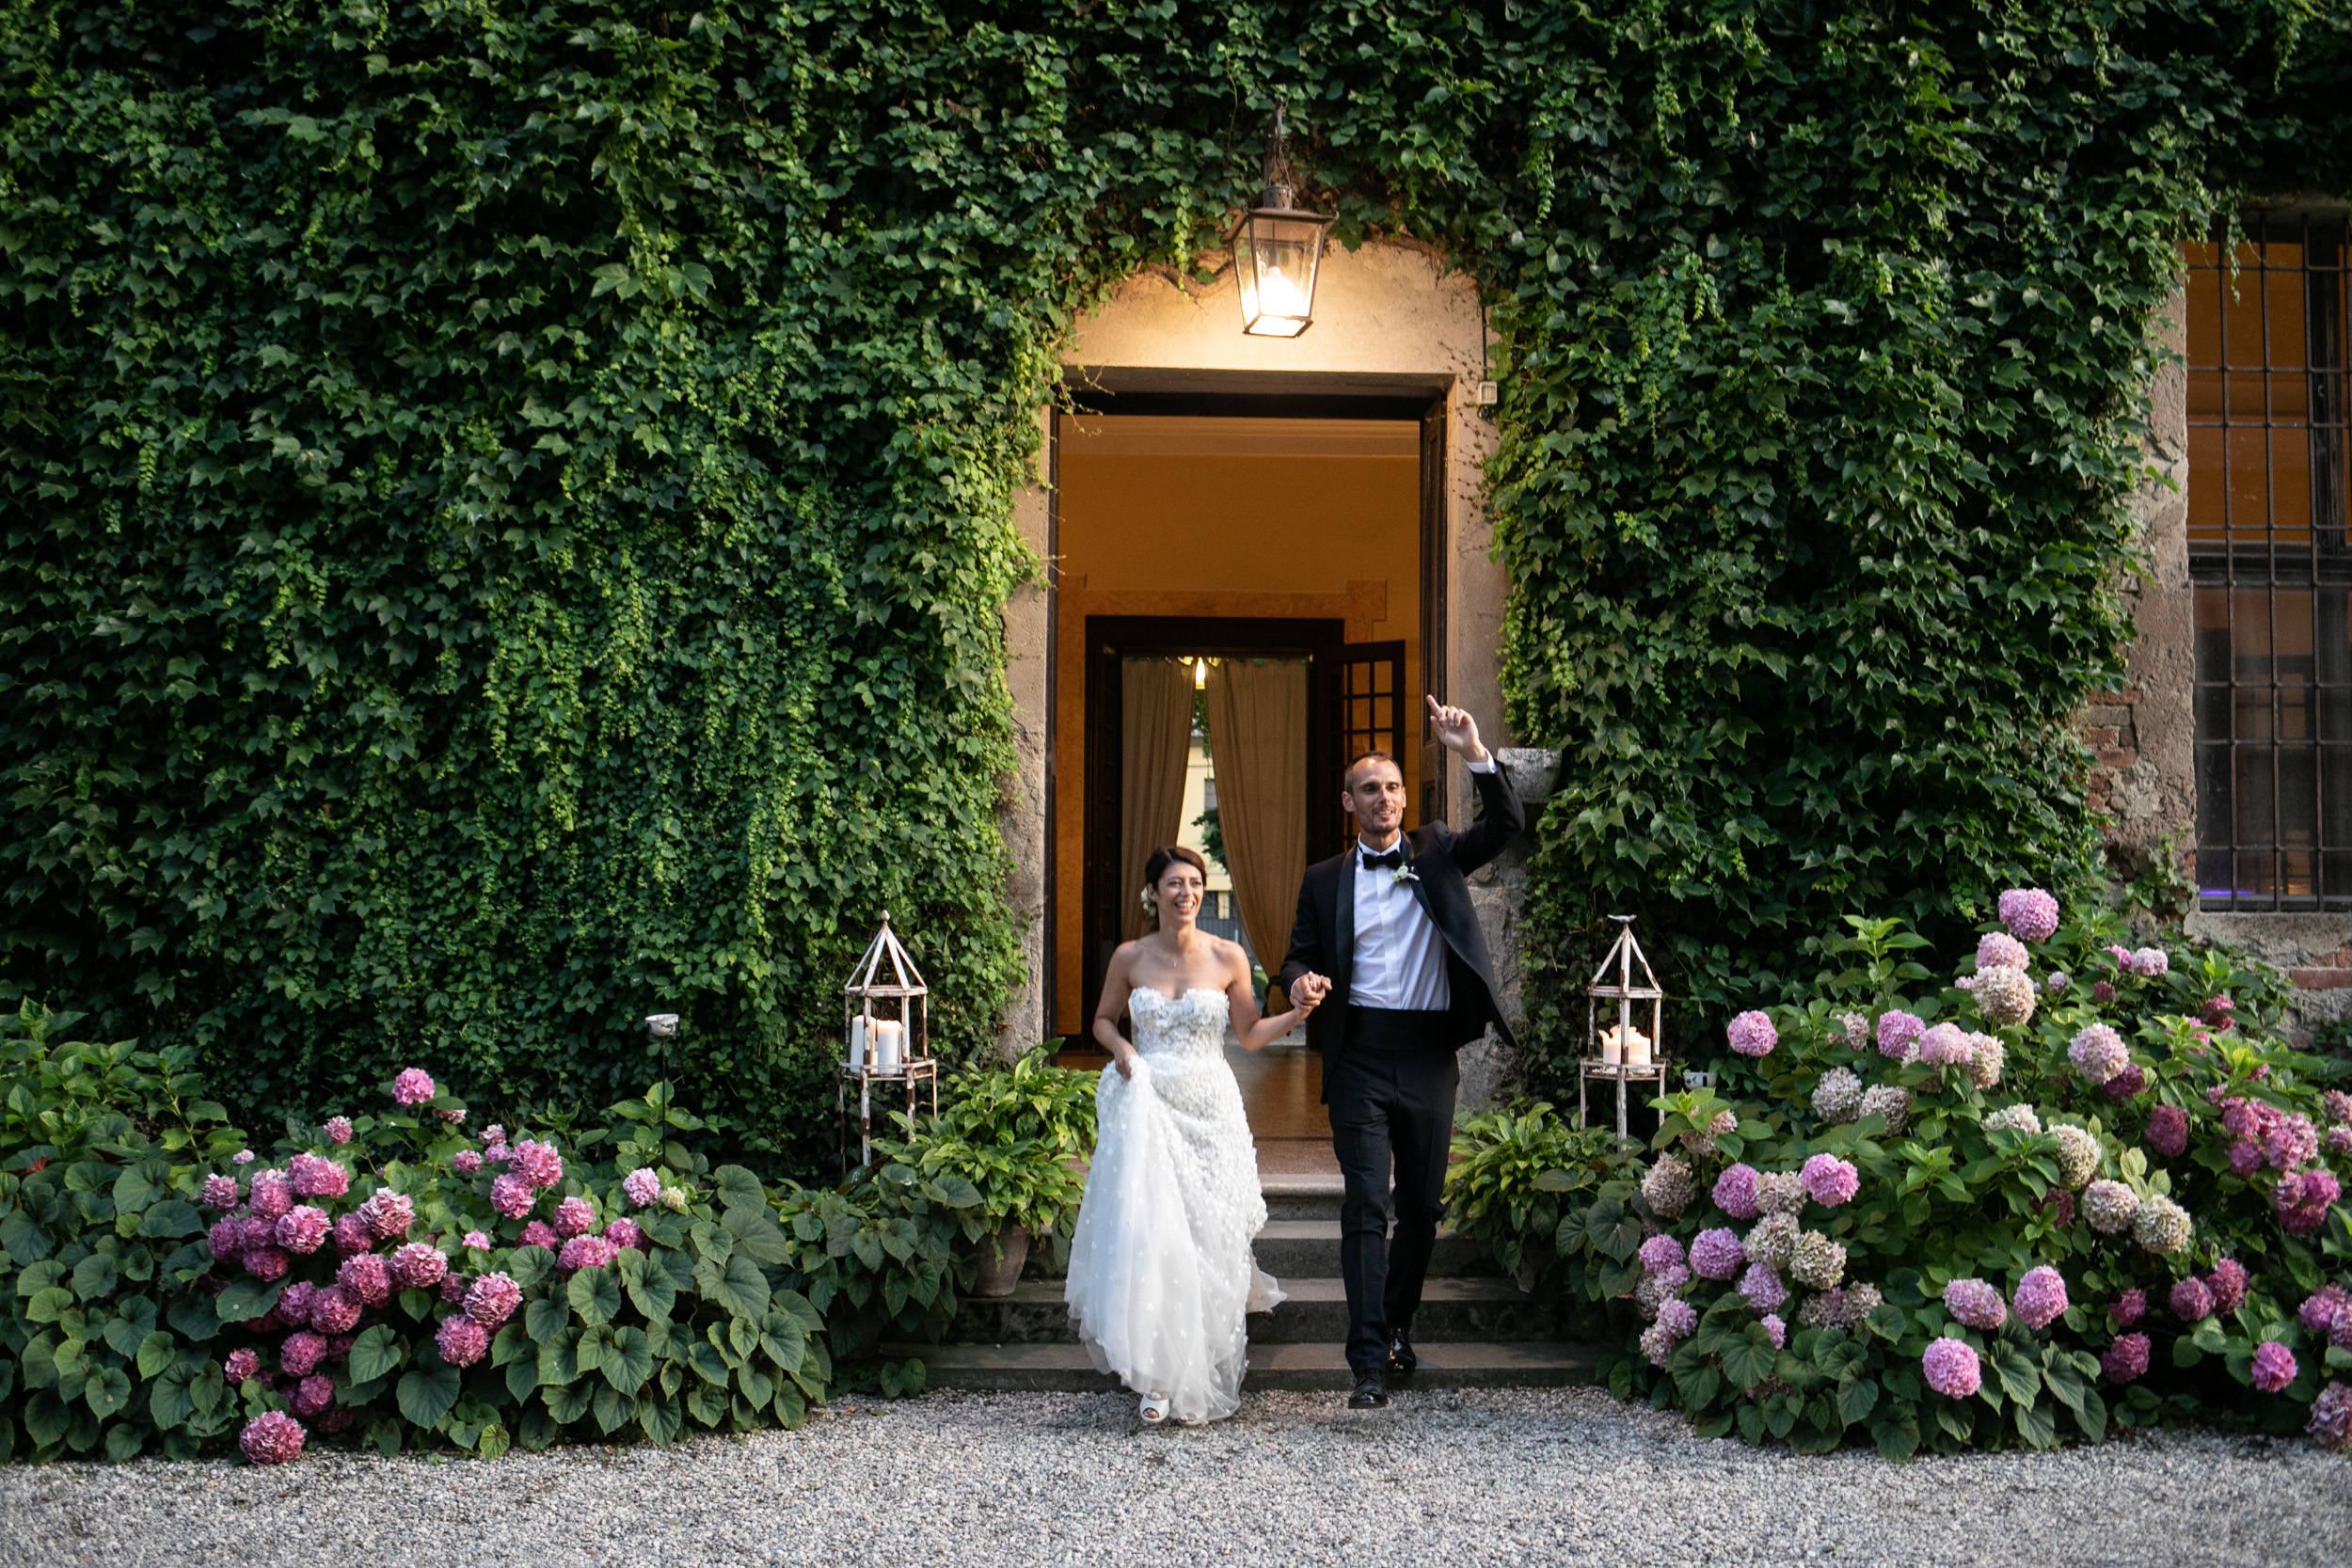 matrimonio_villa-ferrari-gussola_MI-099